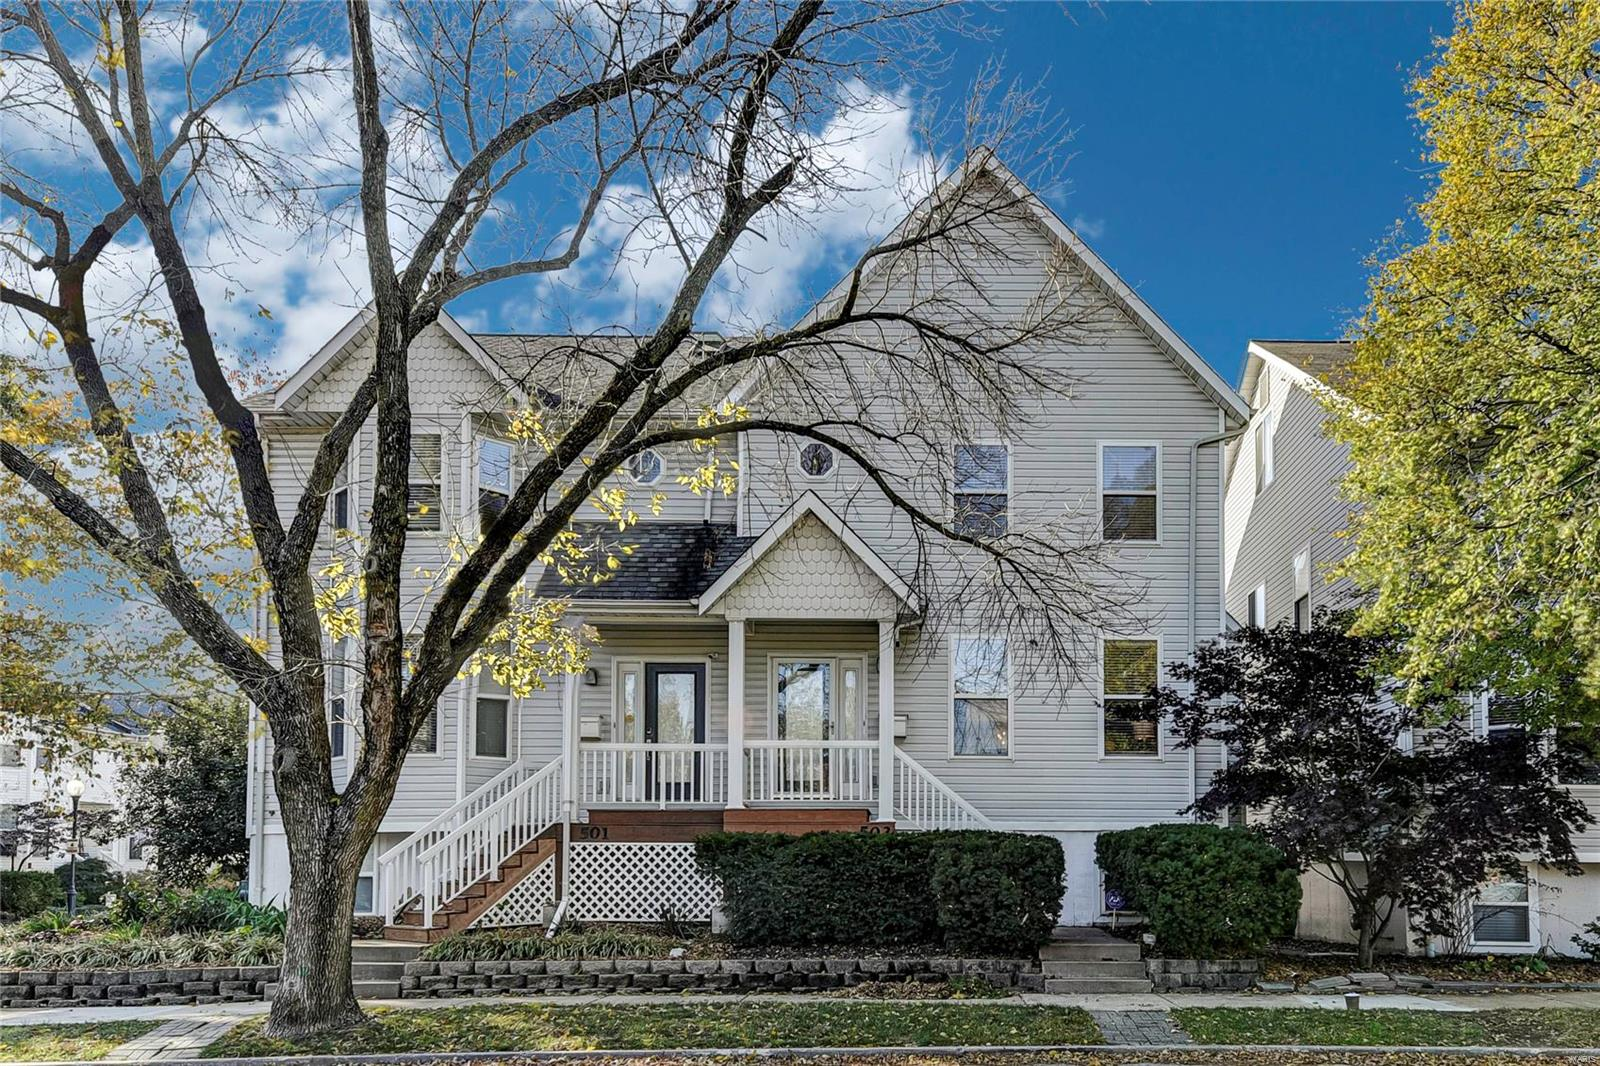 503 W Kingsbury Property Photo - St Louis, MO real estate listing